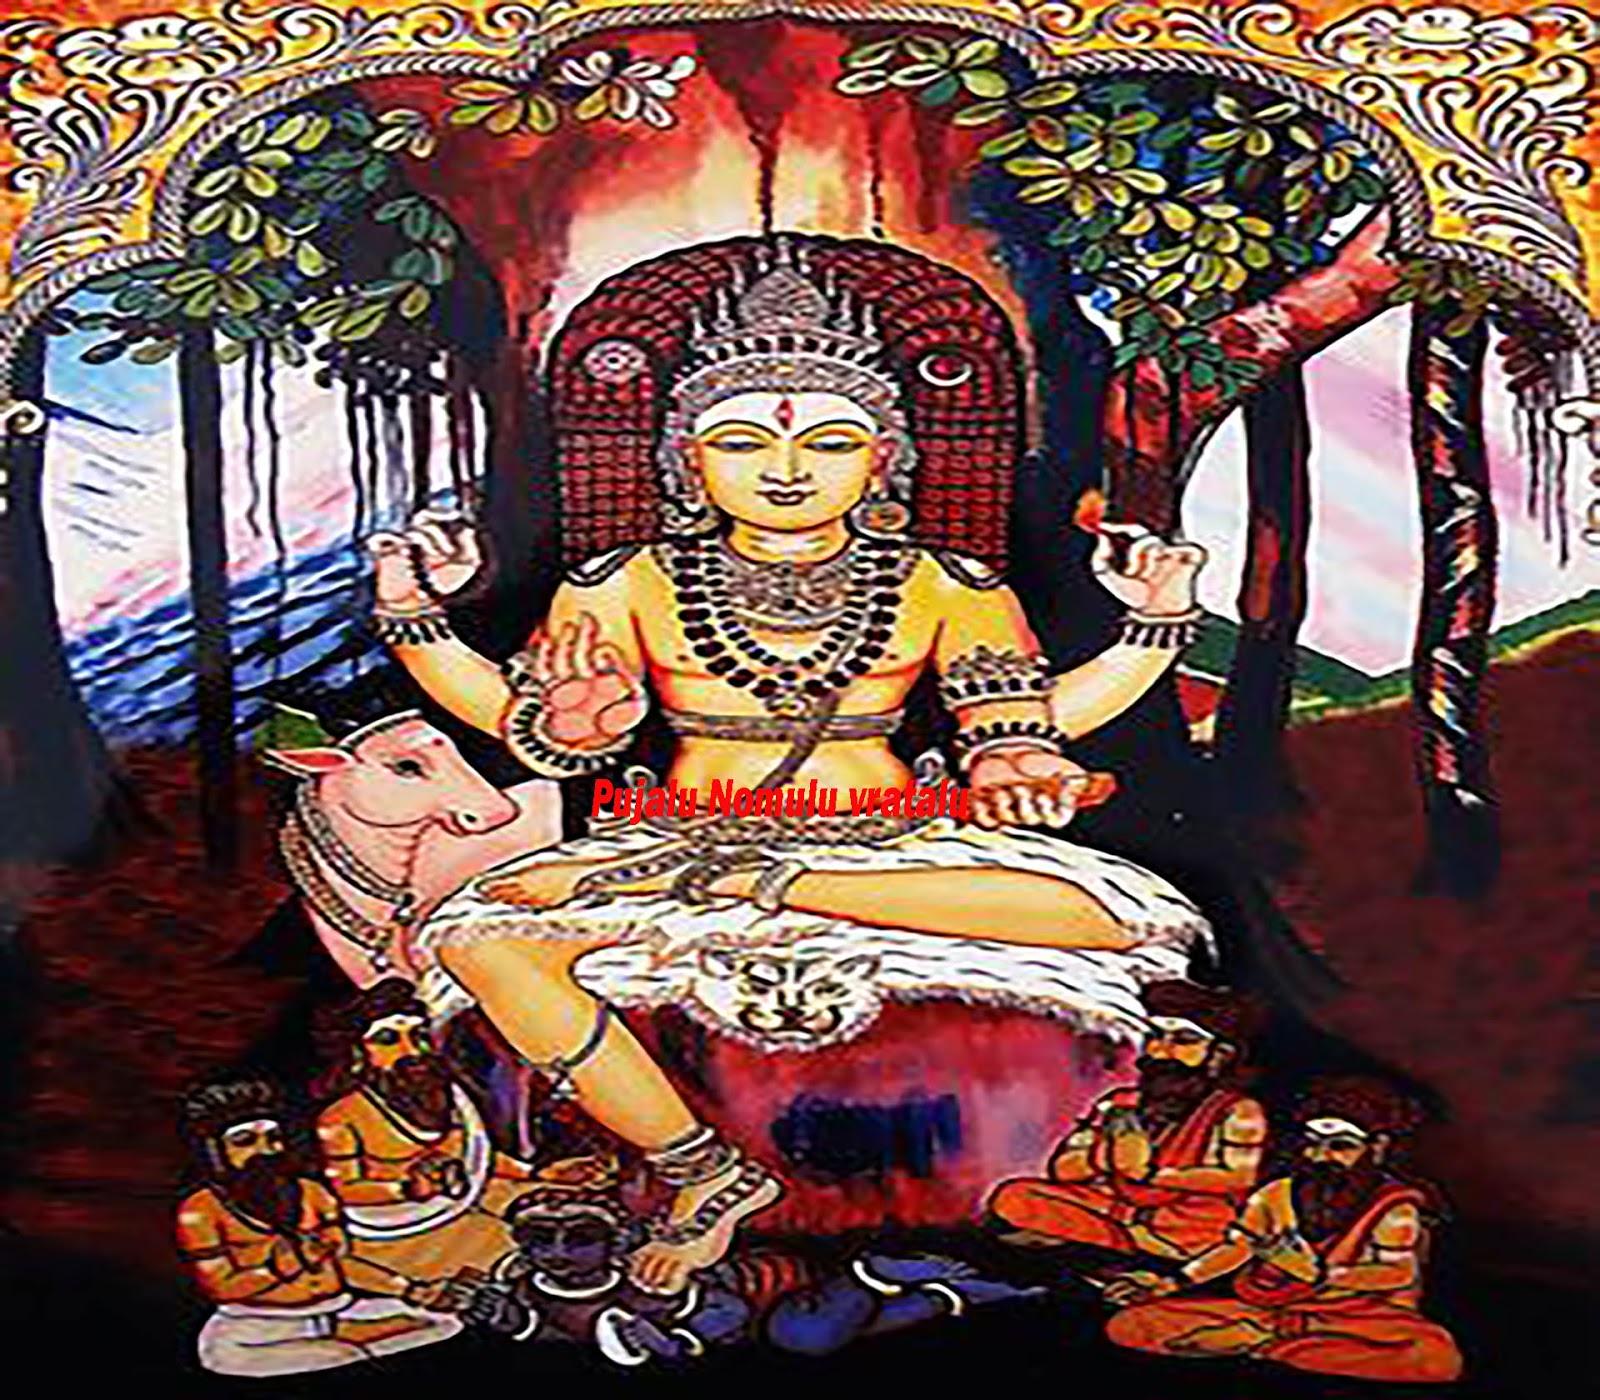 dakshinamurthy stotram mp3 download free